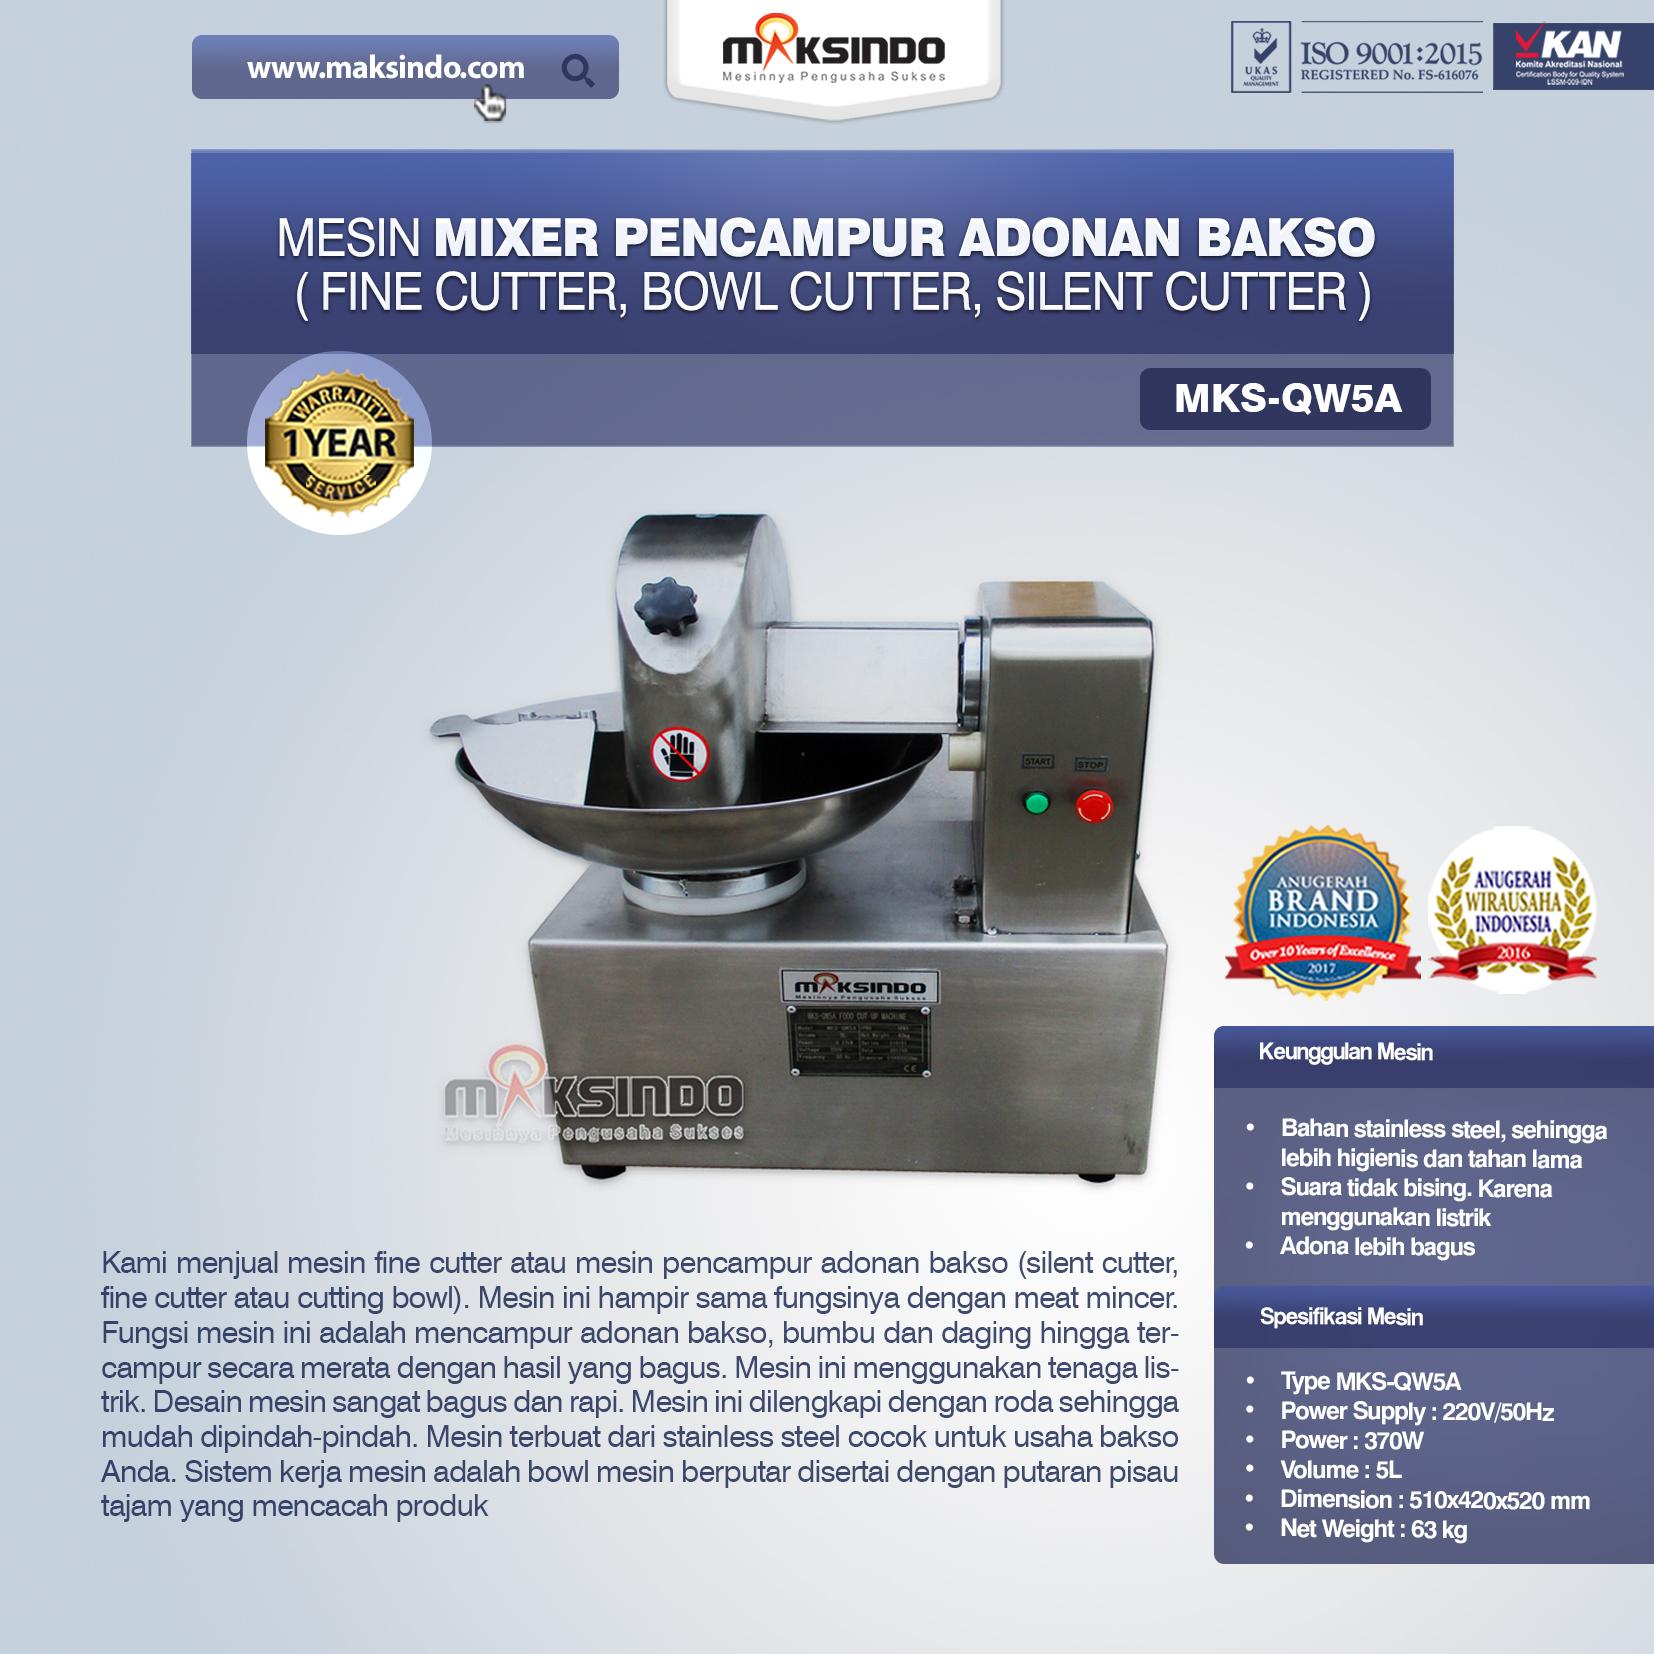 Jual Mesin Mixer Pencampur Adonan Bakso di Jakarta